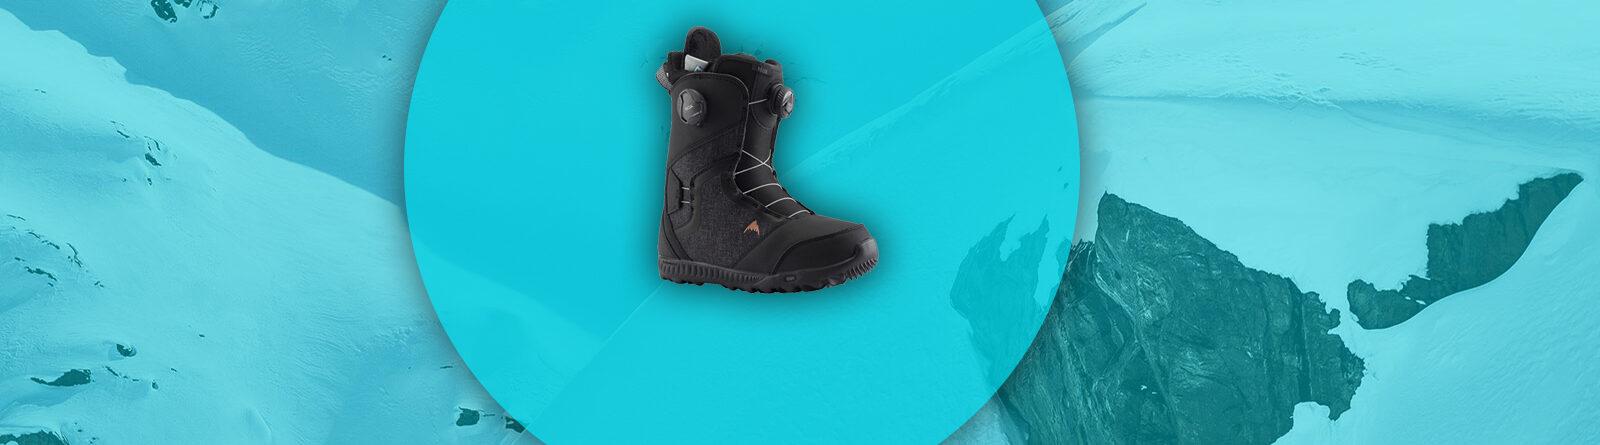 e91ea86df25 Burton Felix Boa Snowboard Boots - Women s 2019